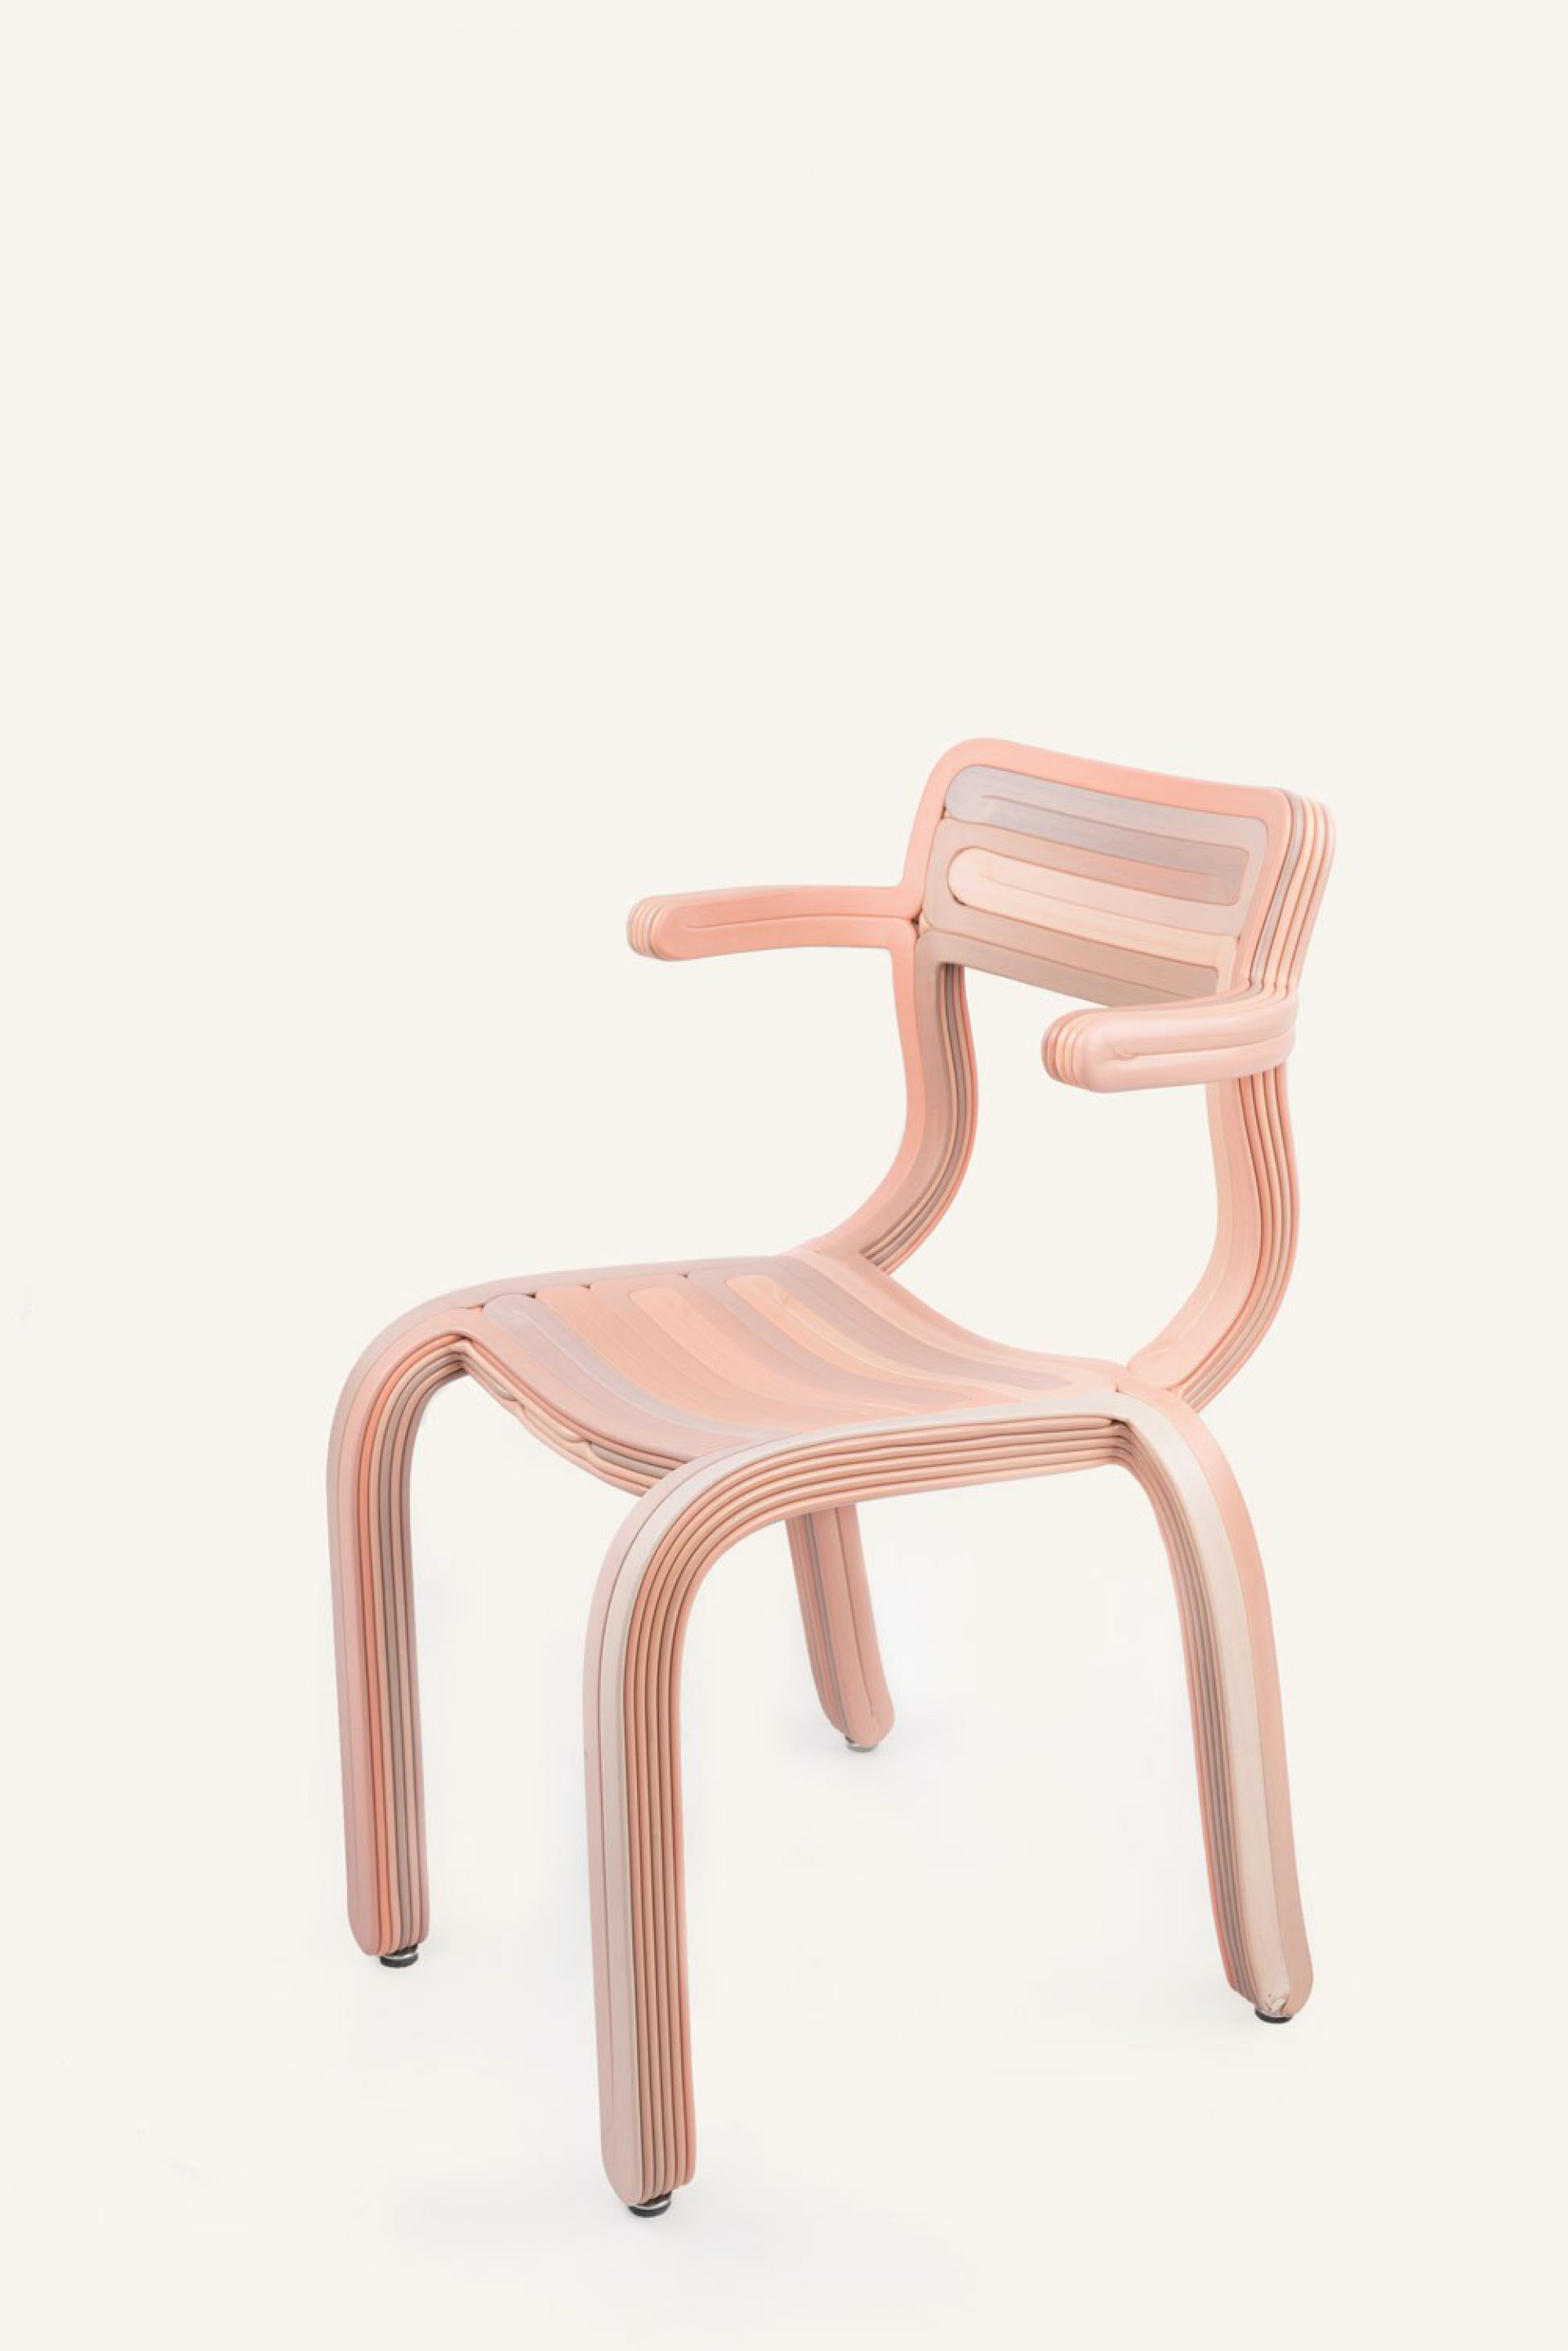 Kooij Rv R chair Pink